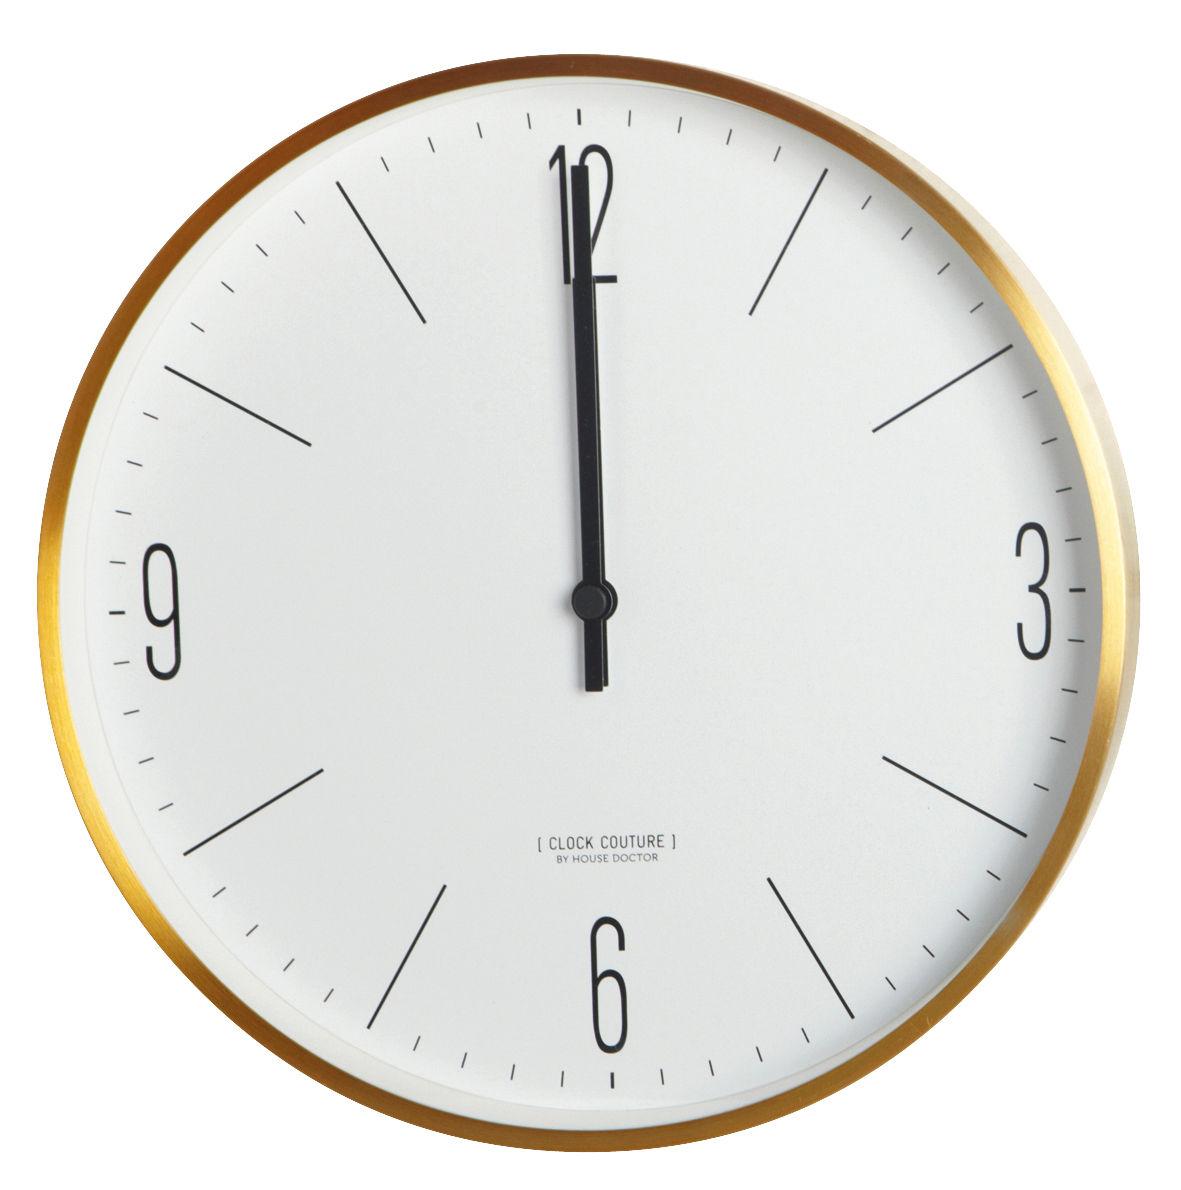 horloge murale clock couture 30 cm or house doctor. Black Bedroom Furniture Sets. Home Design Ideas